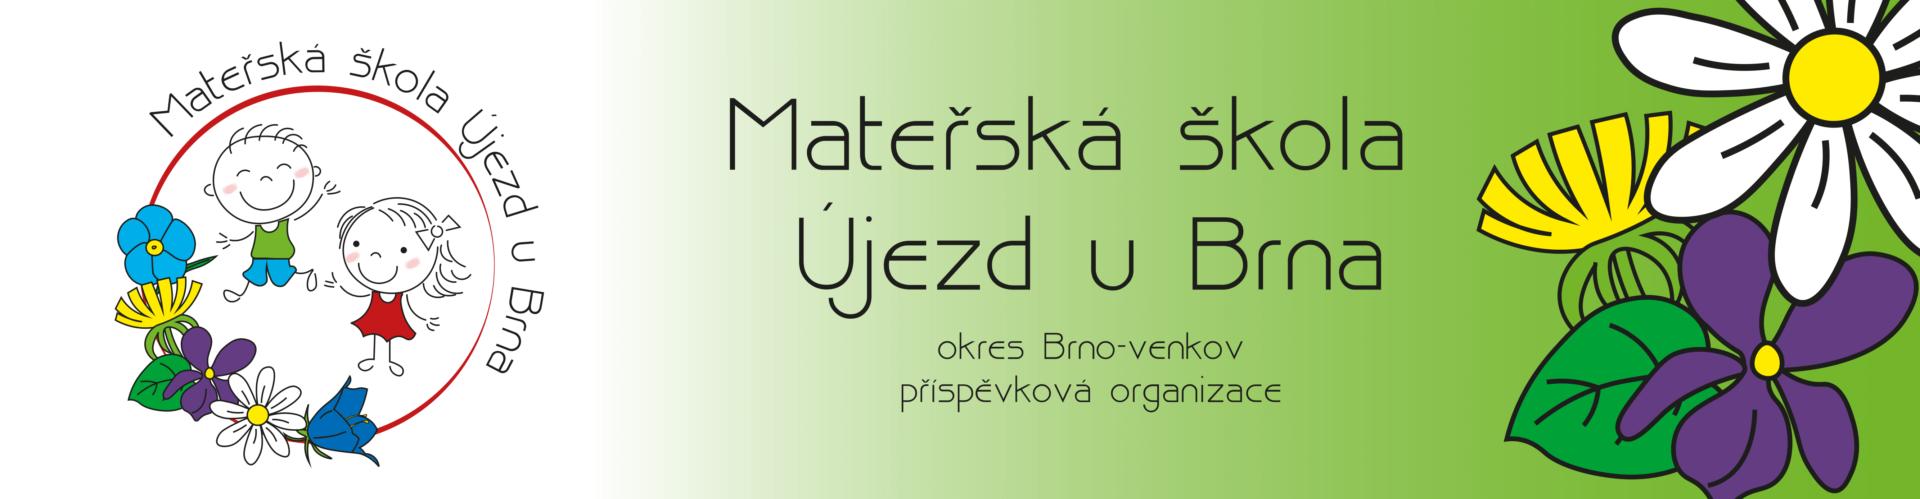 Mateřská škola Újezd u Brna